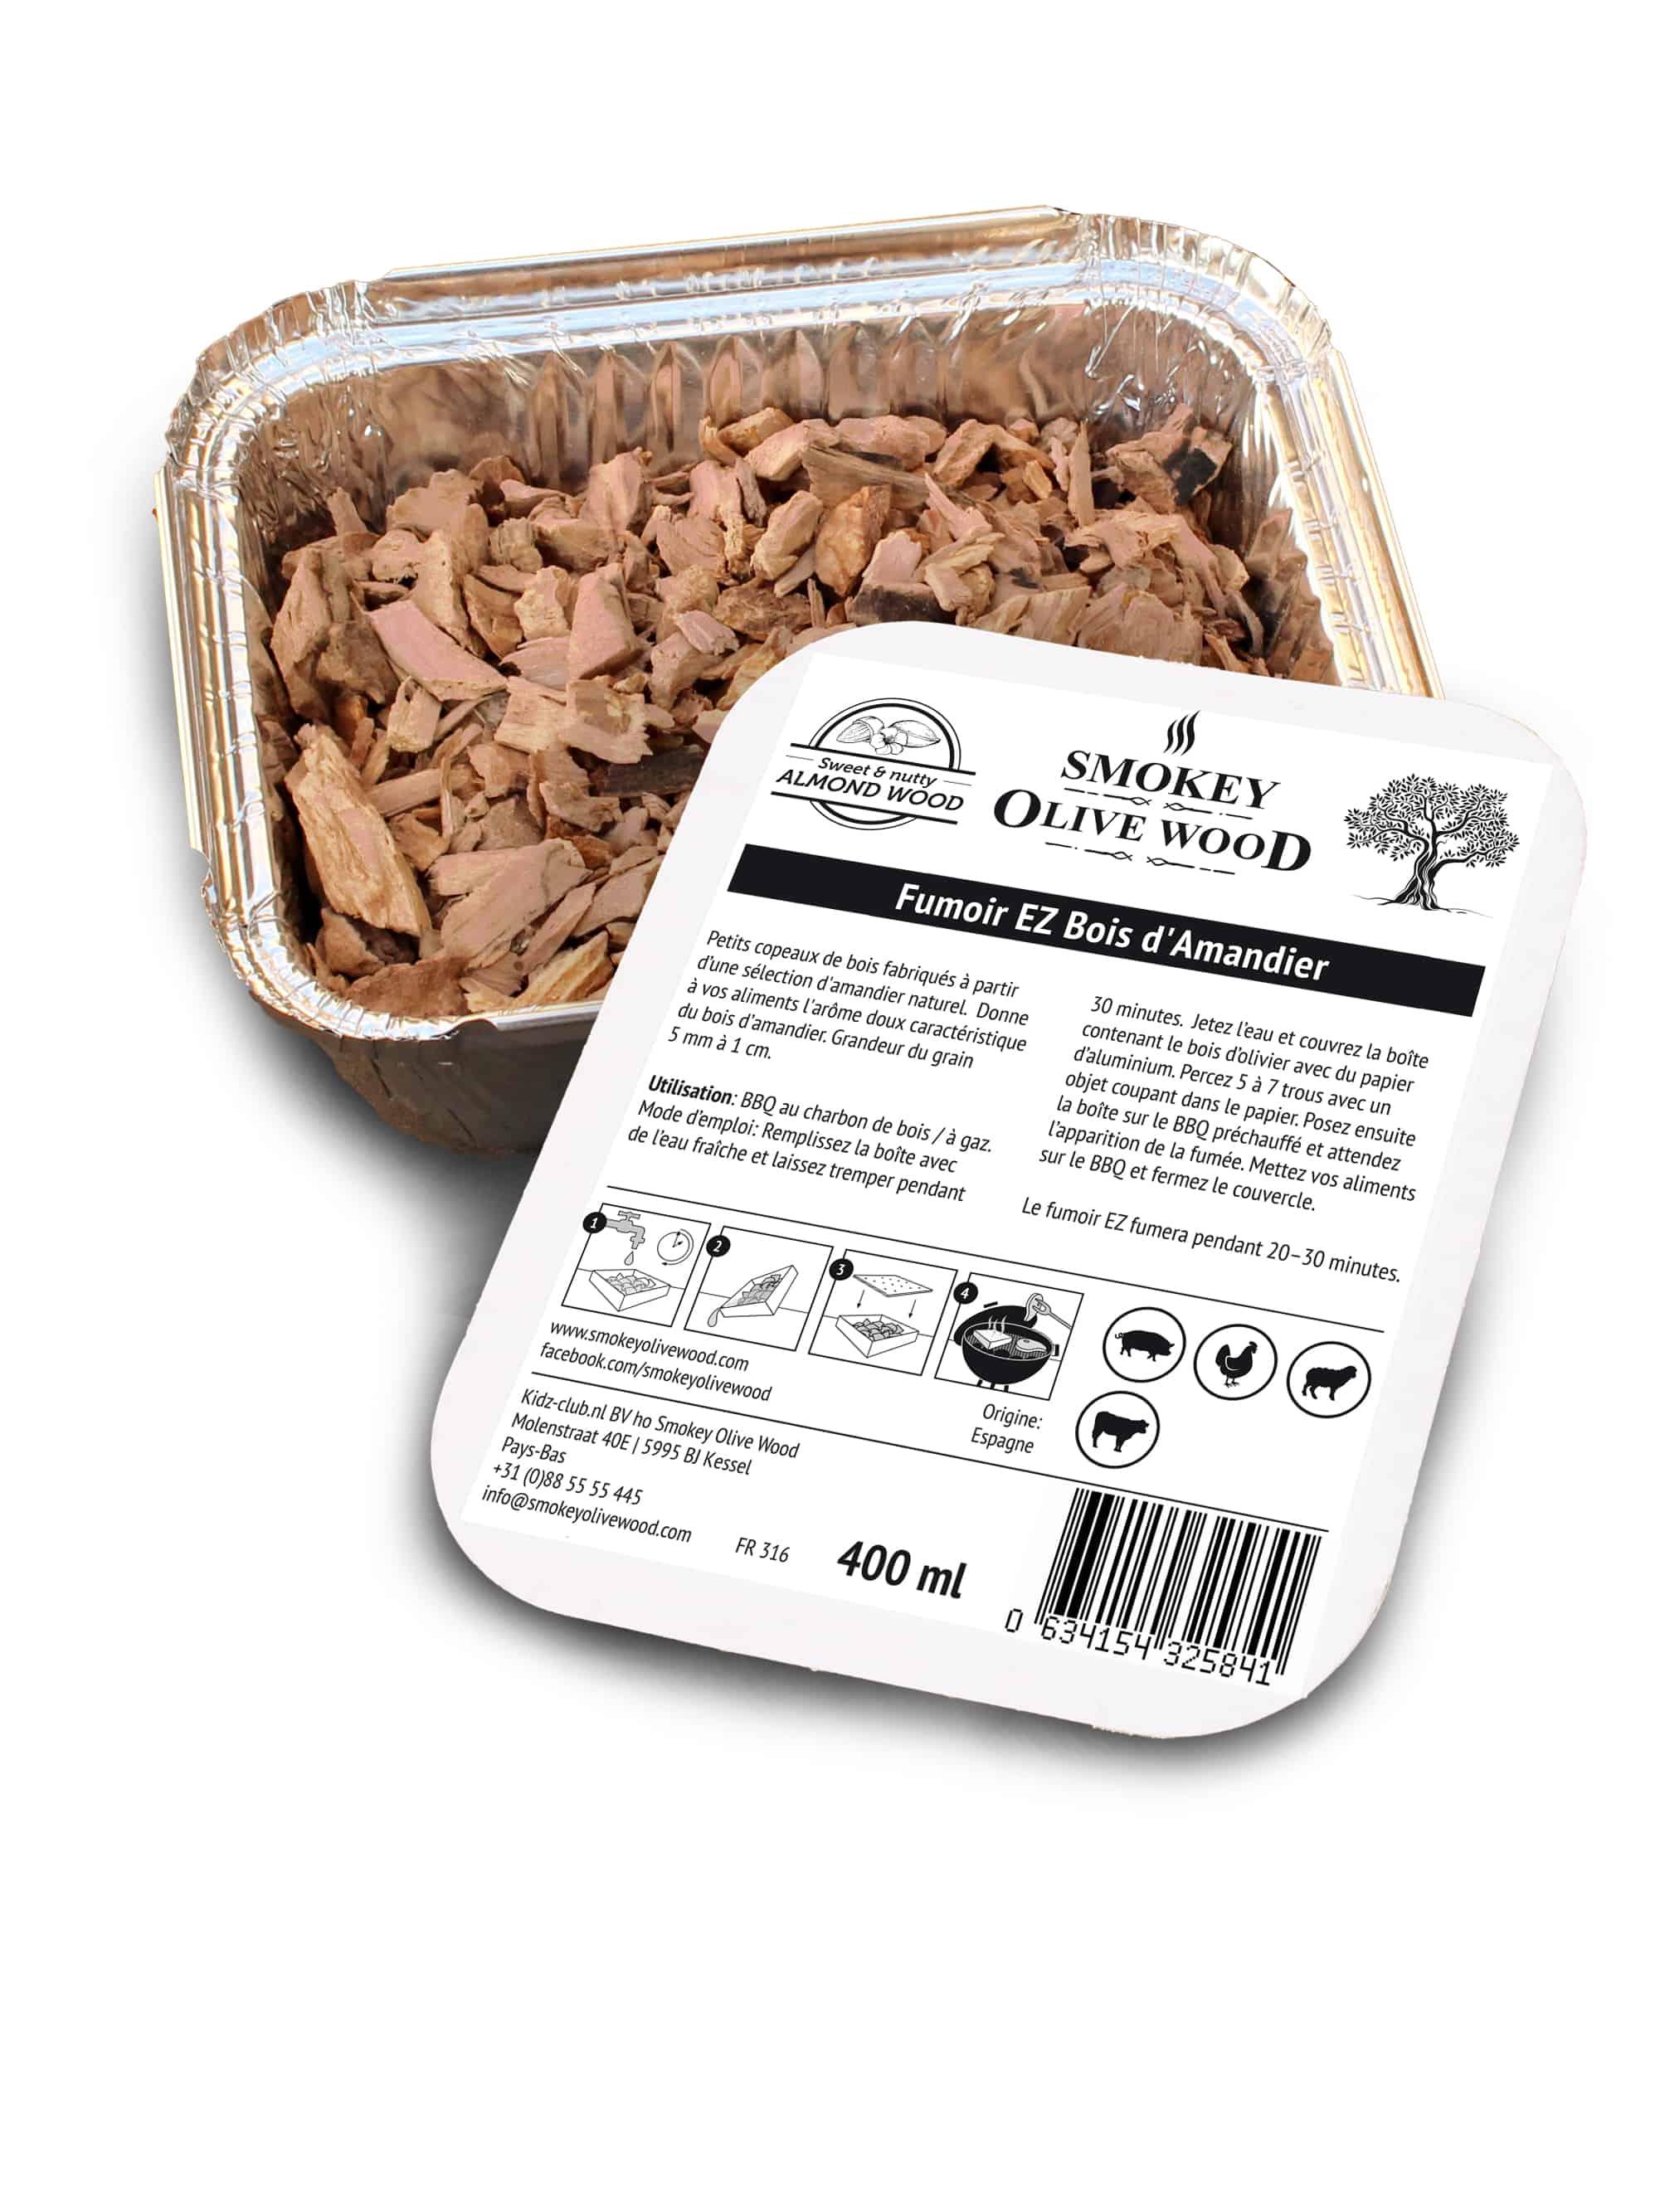 Smokey Olive Wood Sciure amandier Nº1 Smoker BBQ Chips Grill Fumer